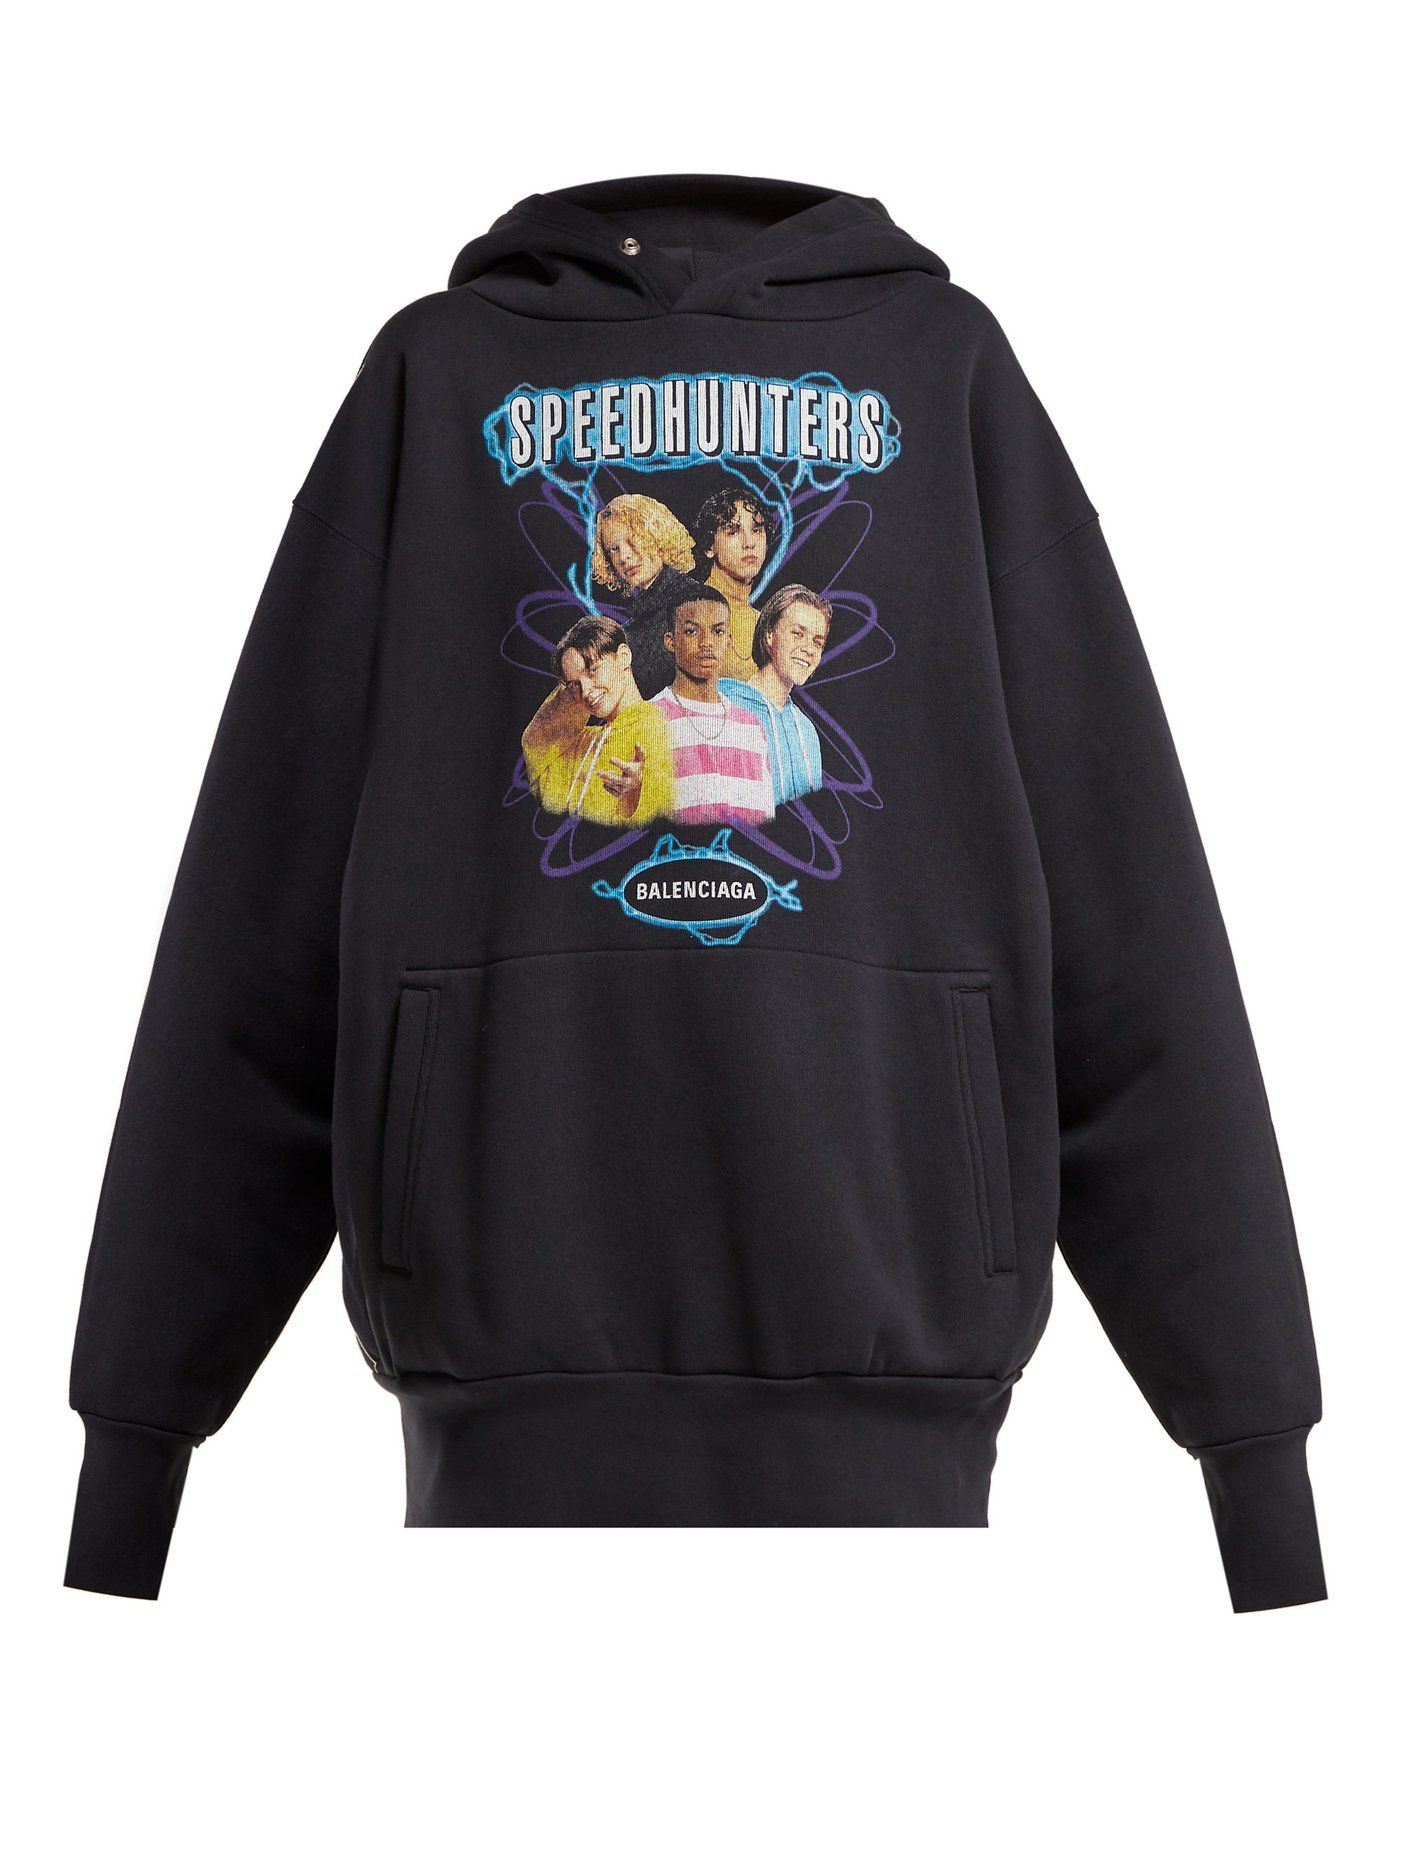 Speedhunters logo-print cotton-jersey sweatshirt   Balenciaga    MATCHESFASHION.COM a25ab7324ee